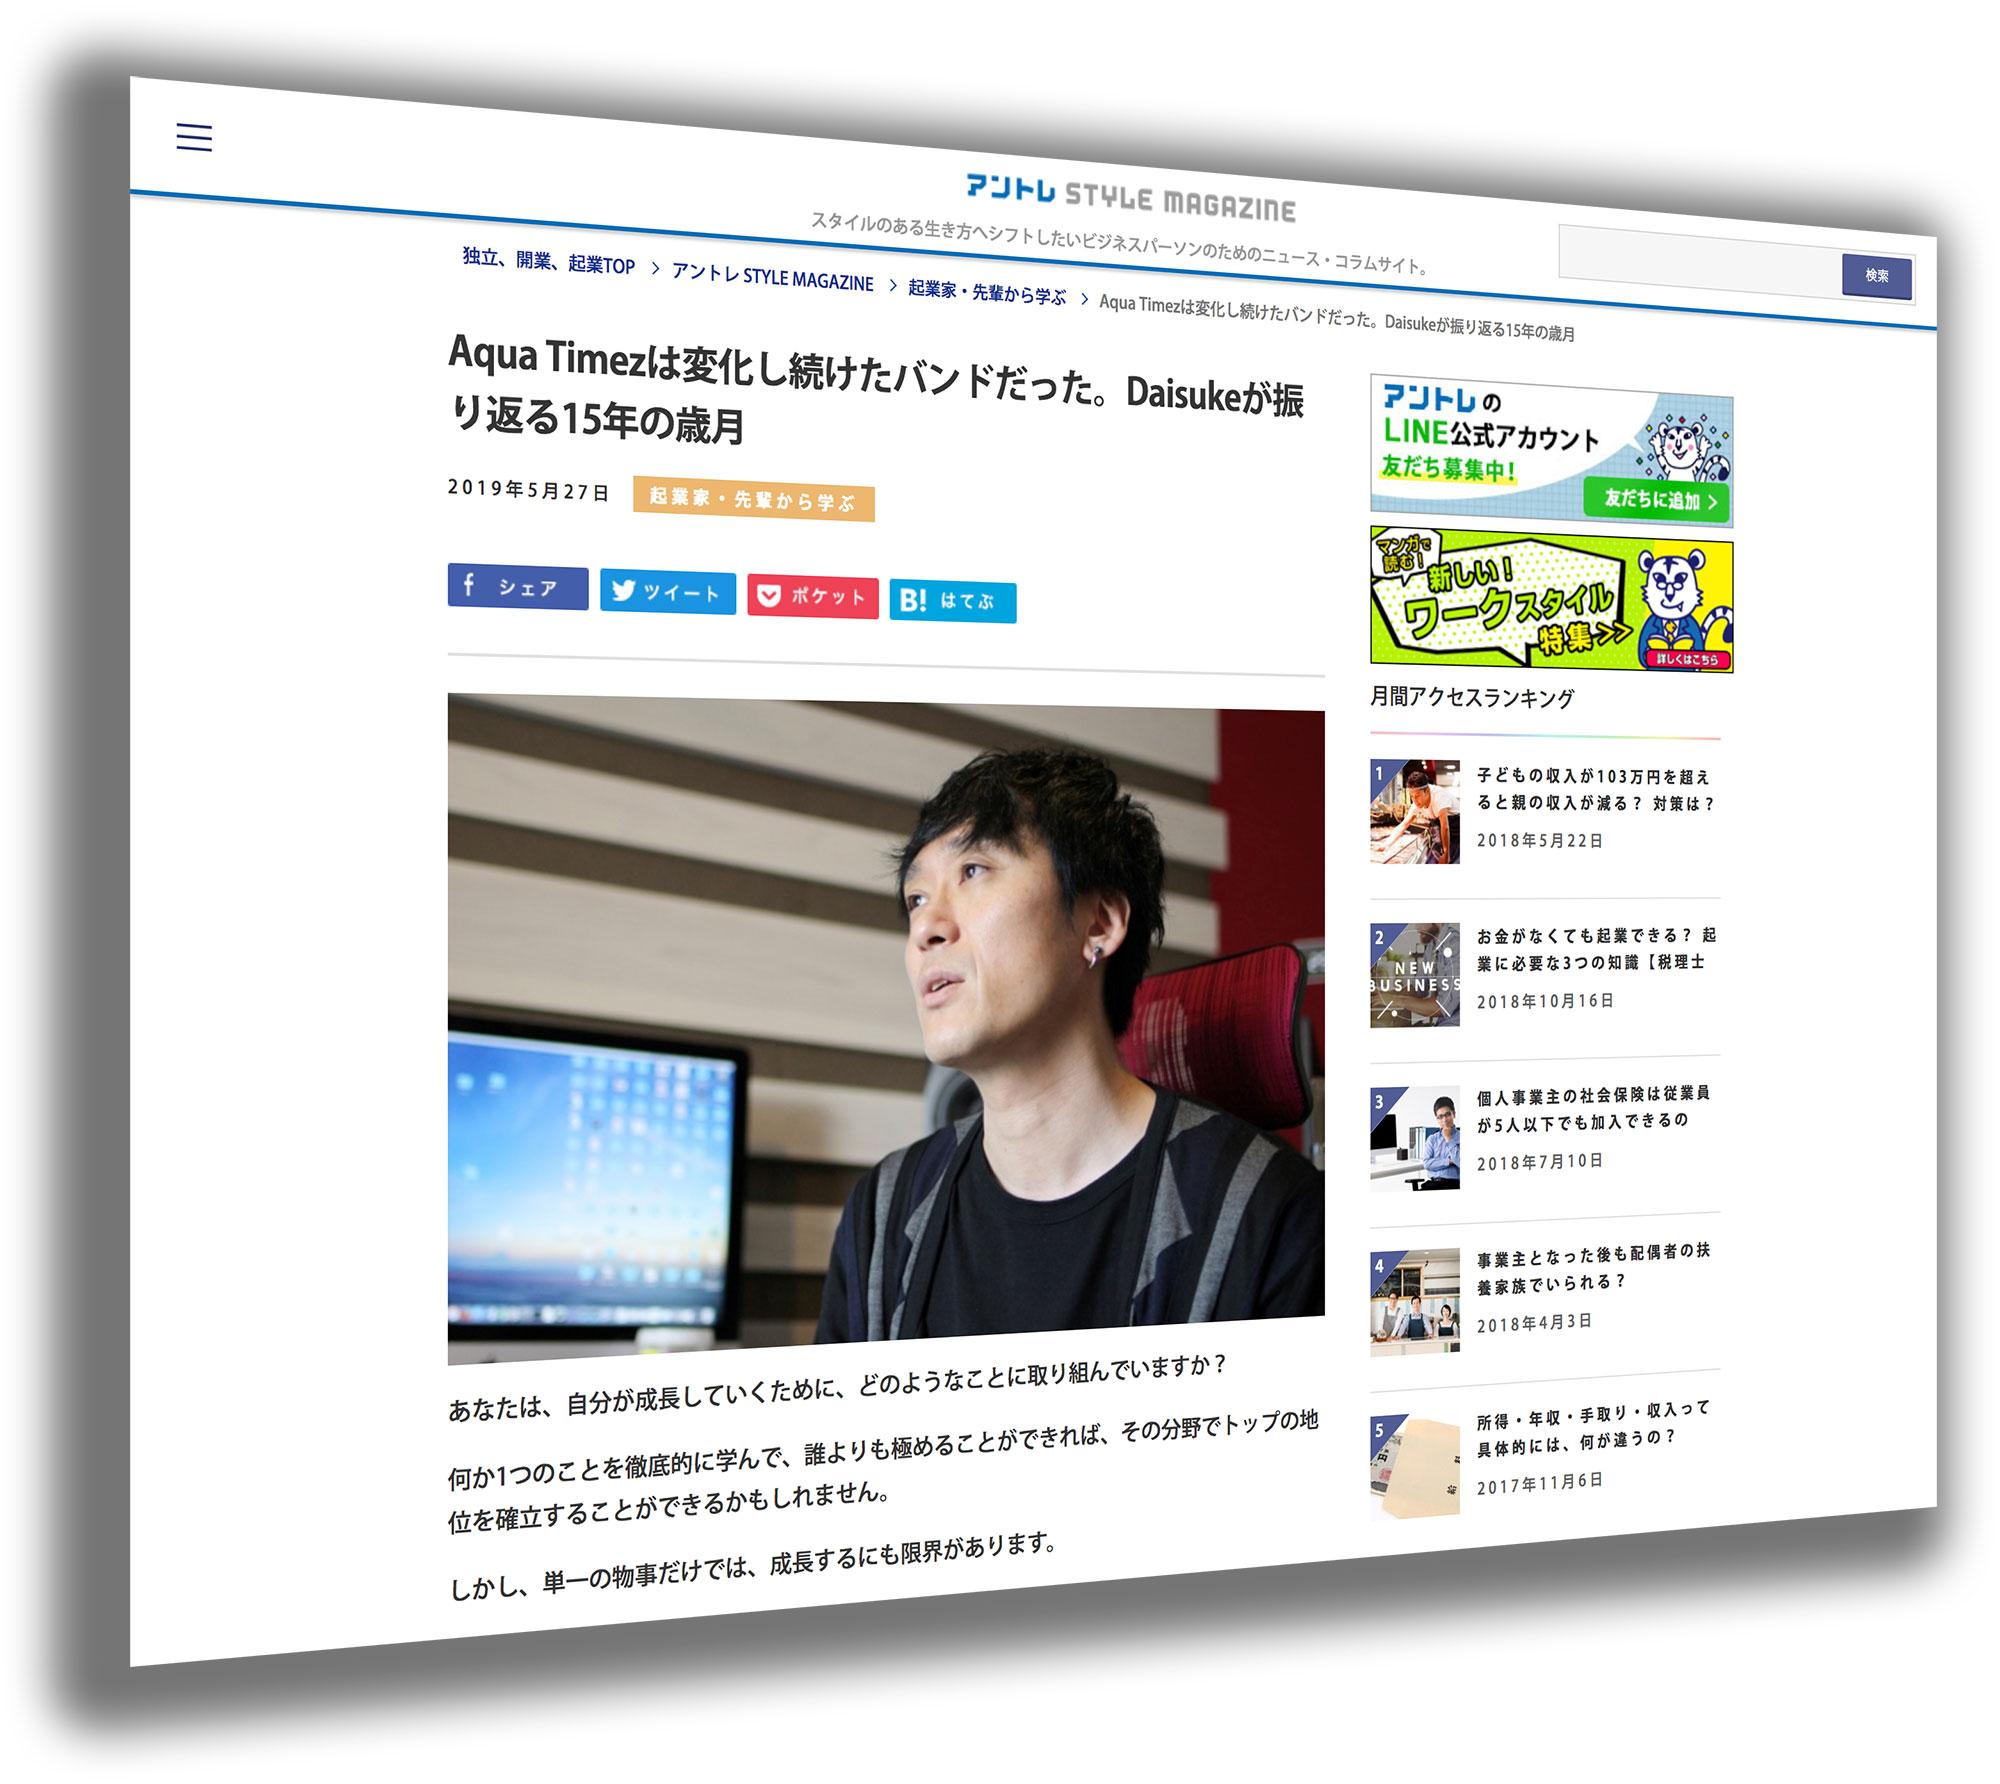 Daisuke Hasegawa 作曲教室